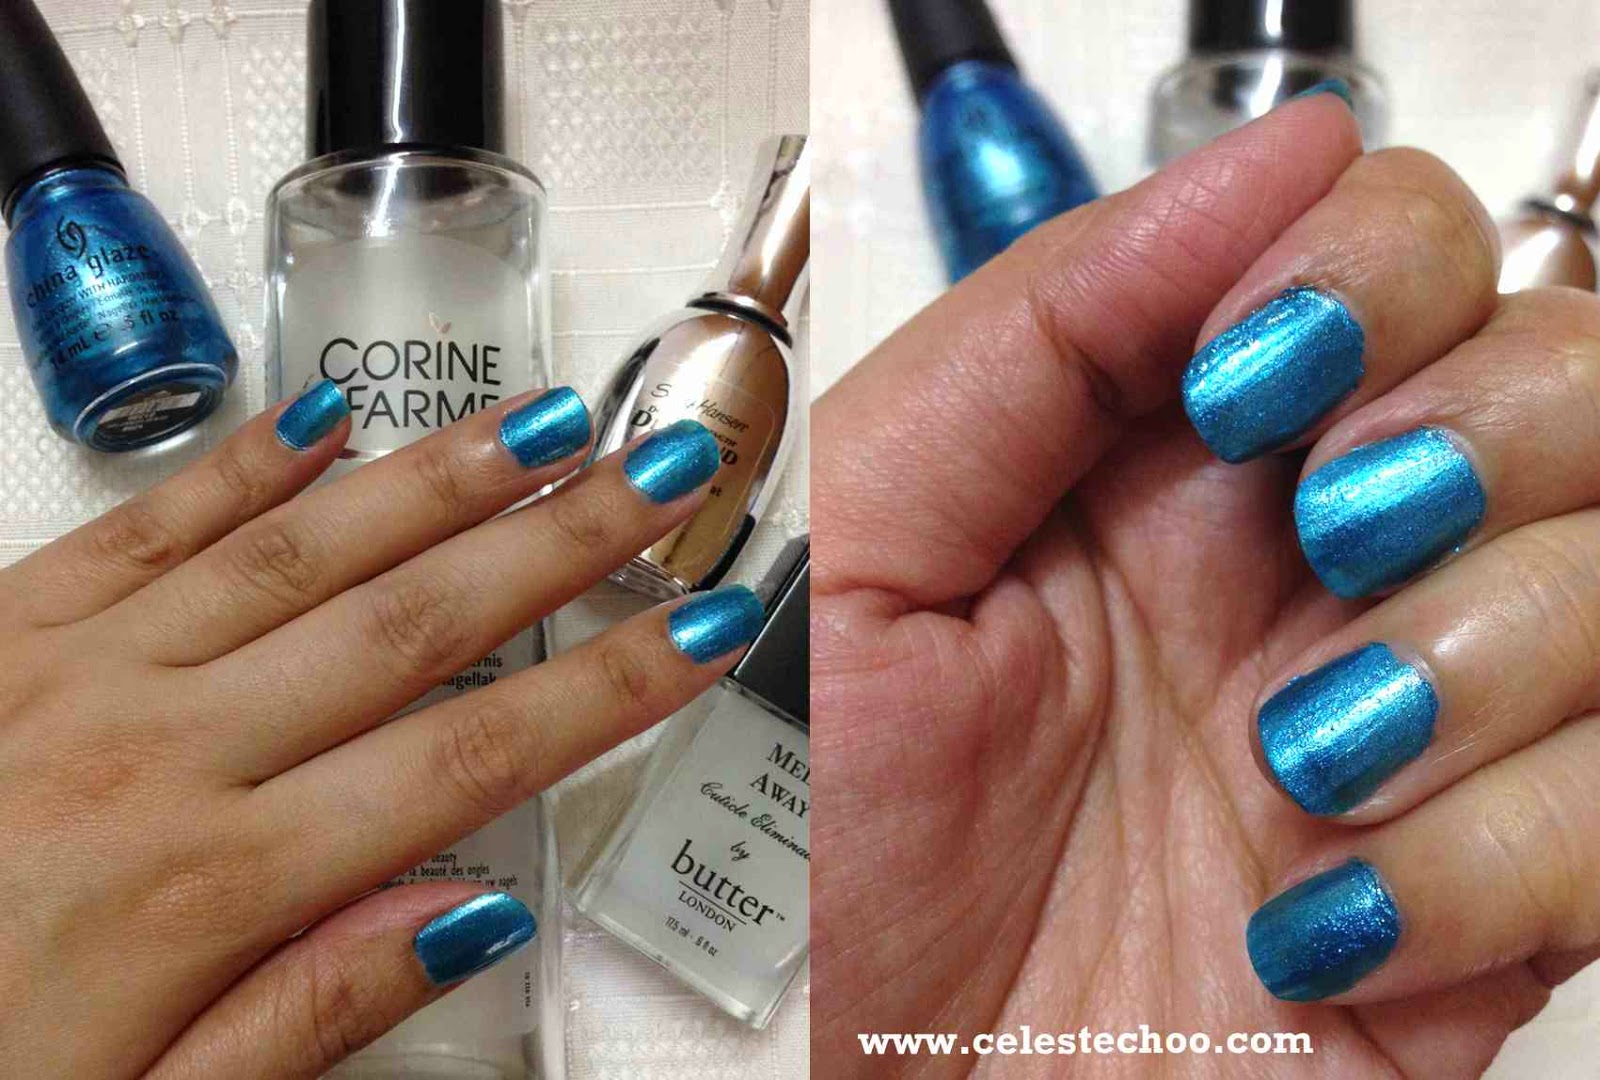 Celestechoo Com China Glaze Nail Polish In So Blue Without You Shade